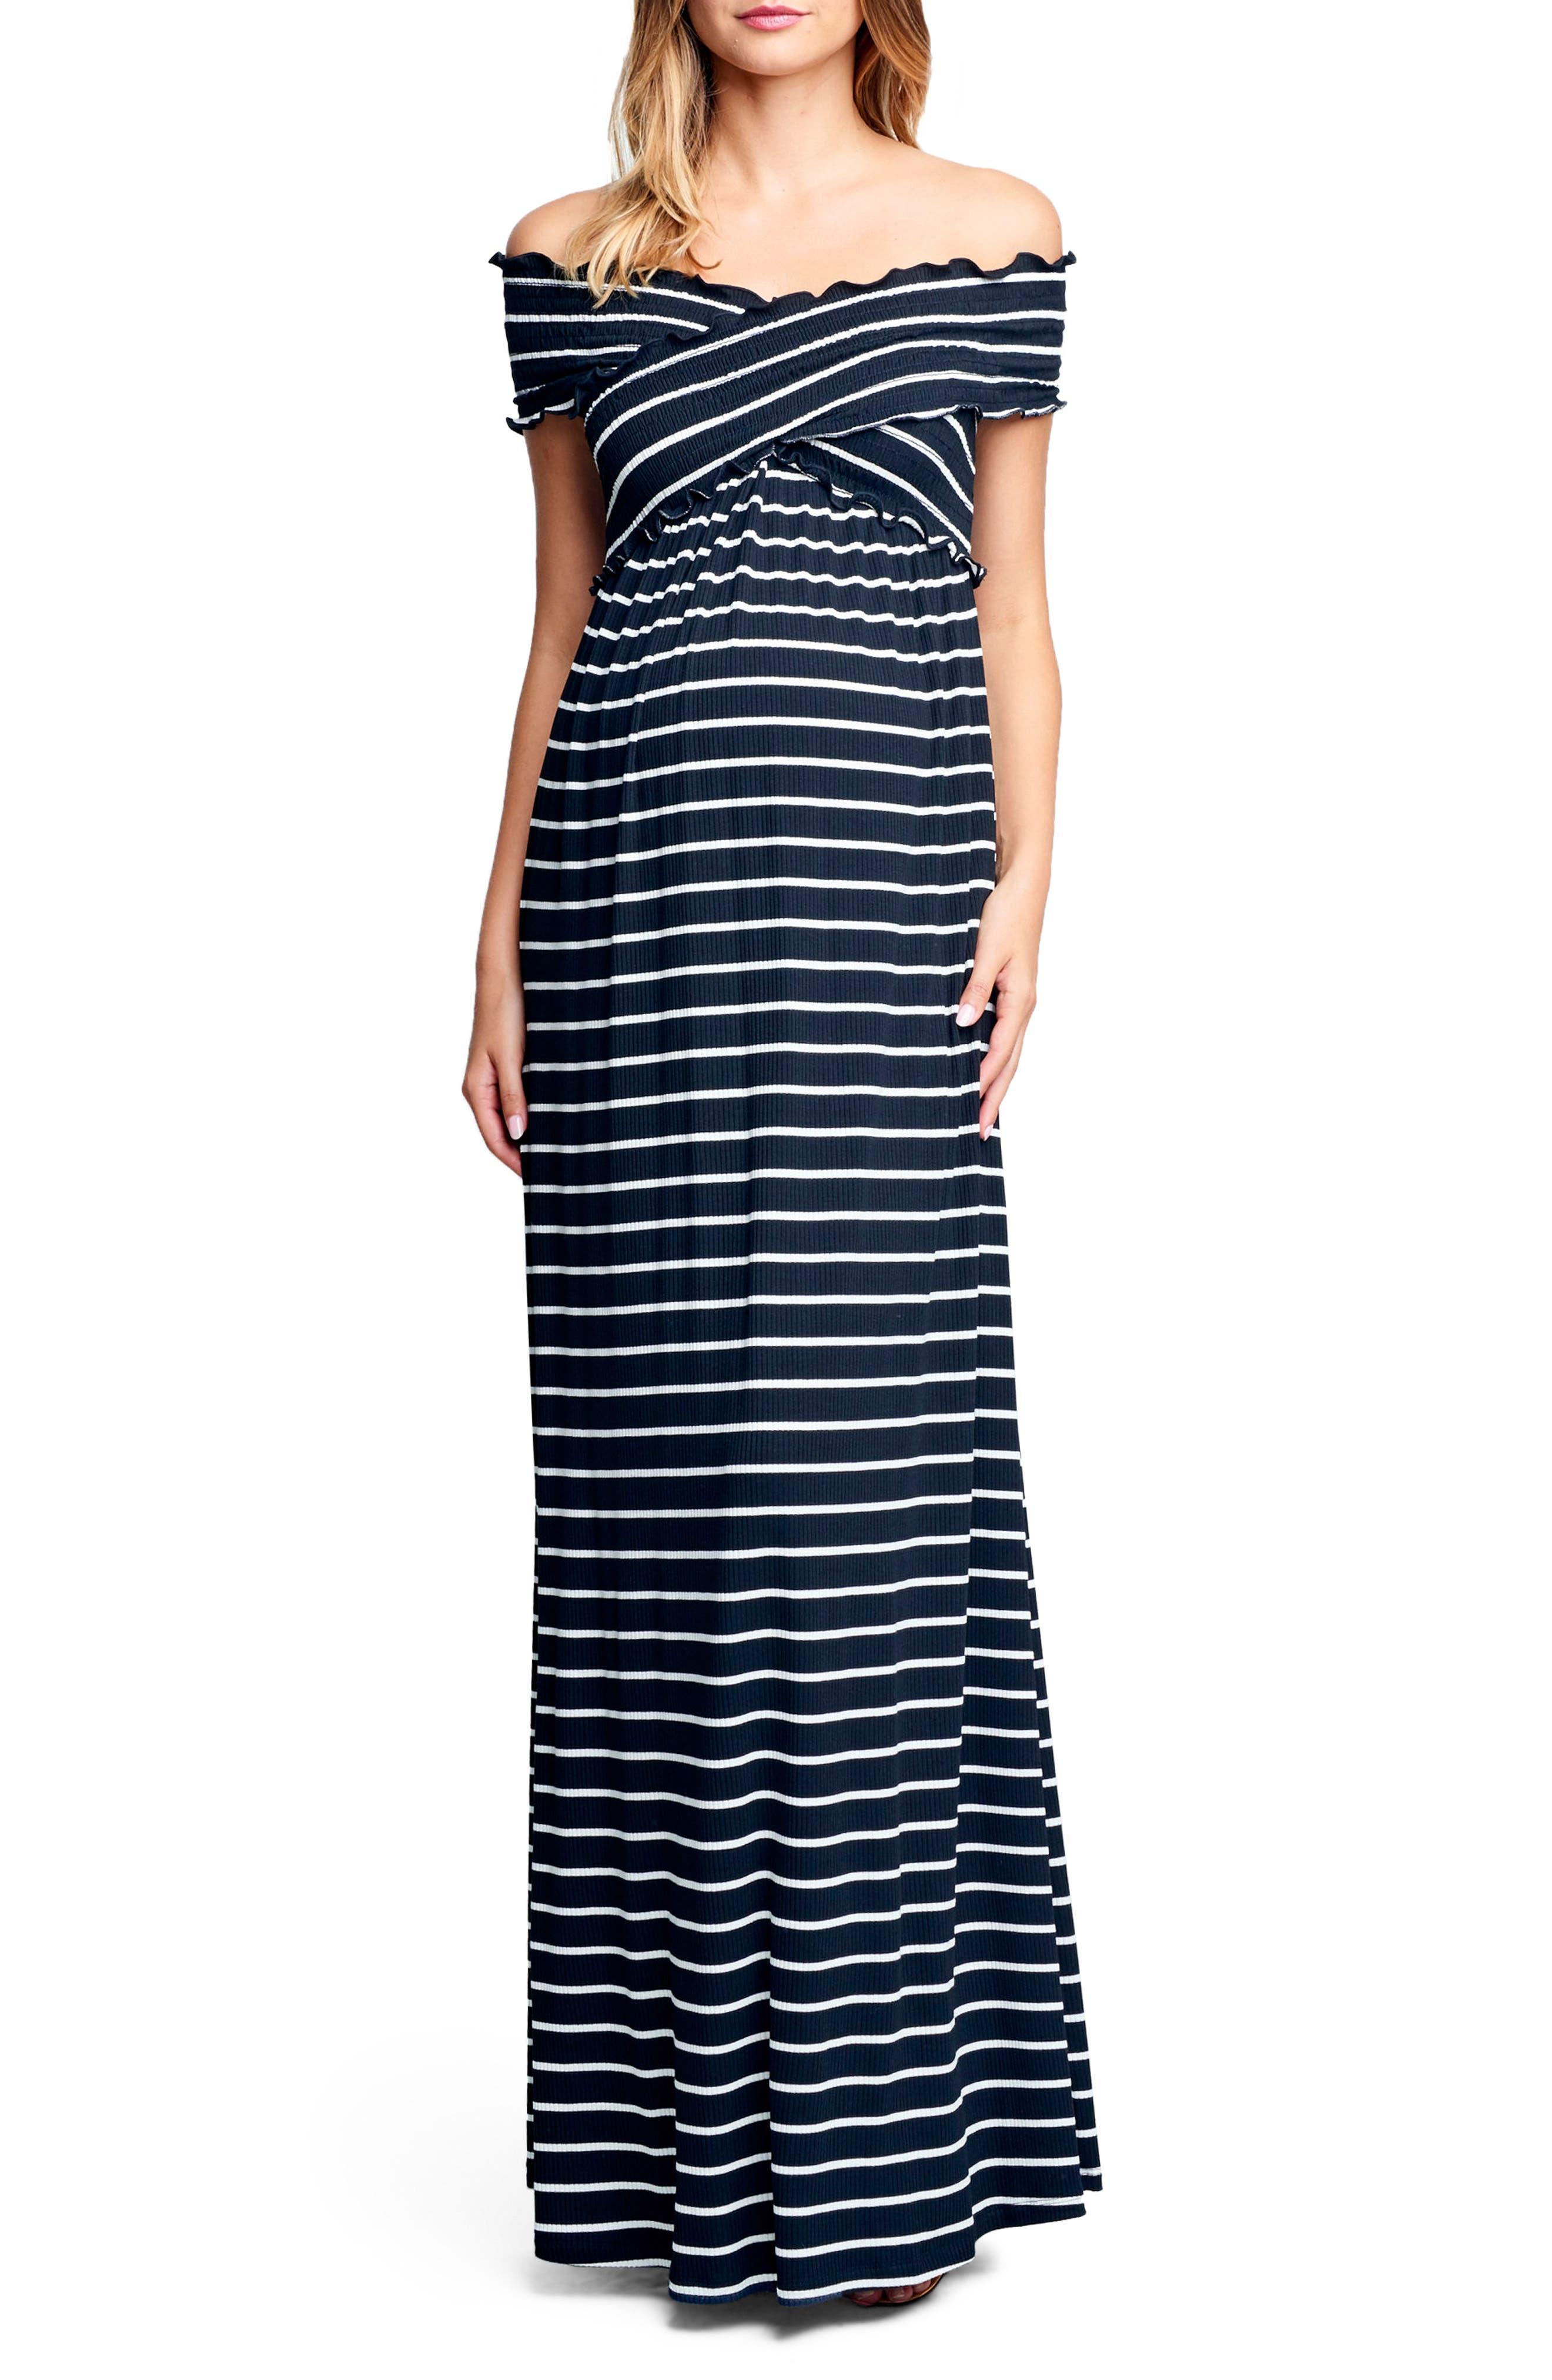 Maternal America Crisscross Off The Shoulder Maxi Maternity Dress